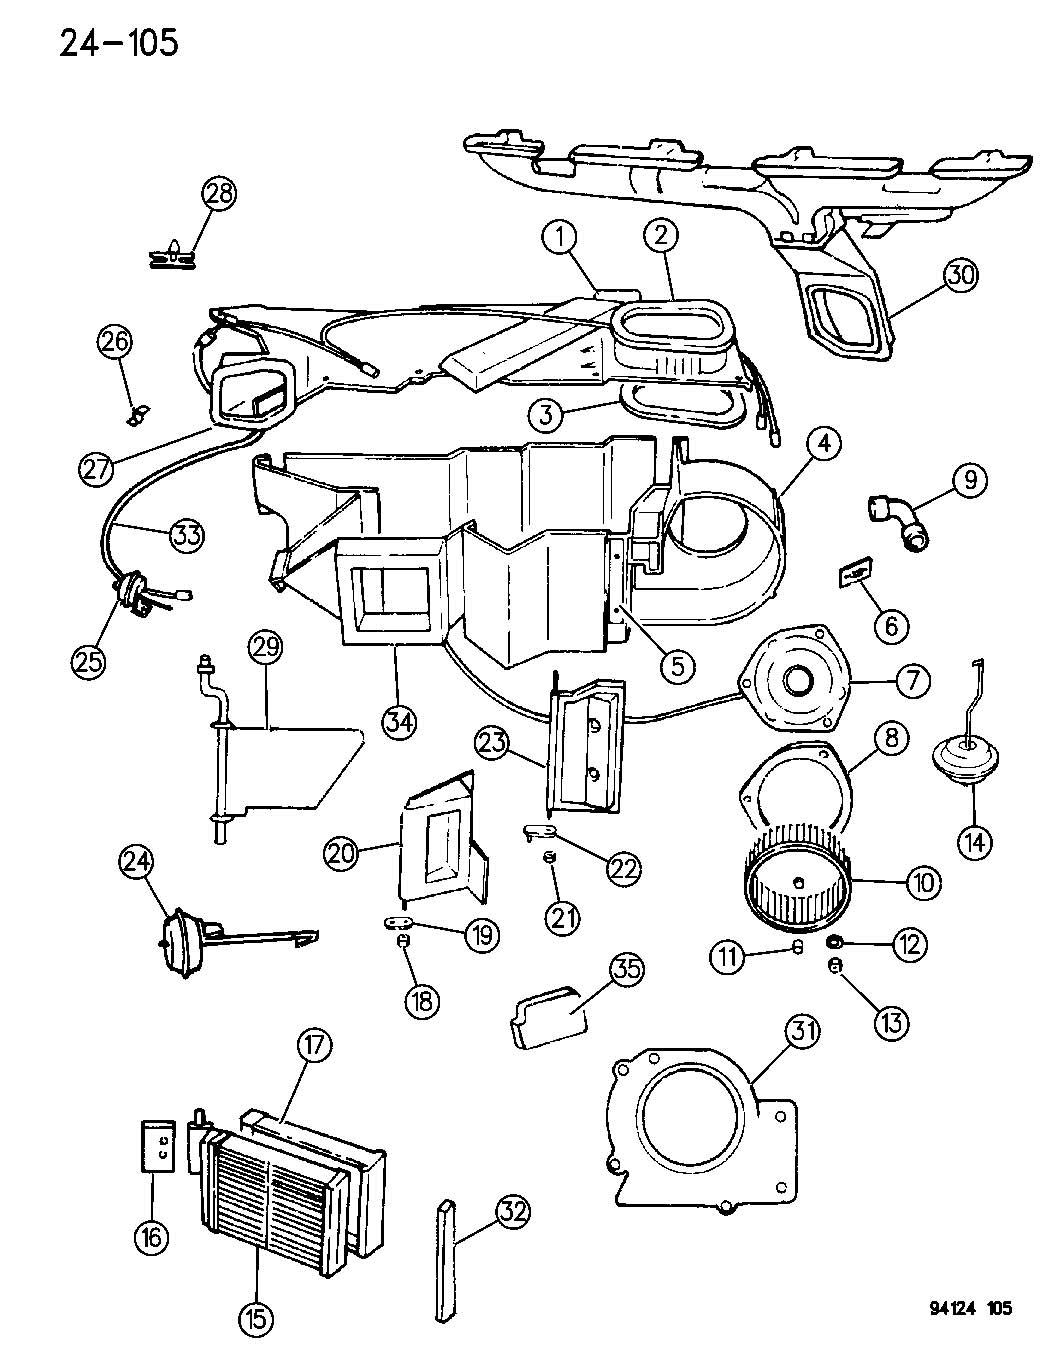 1994 Chrysler Lebaron Fuse Box 1994 Toyota Truck Fuse Box